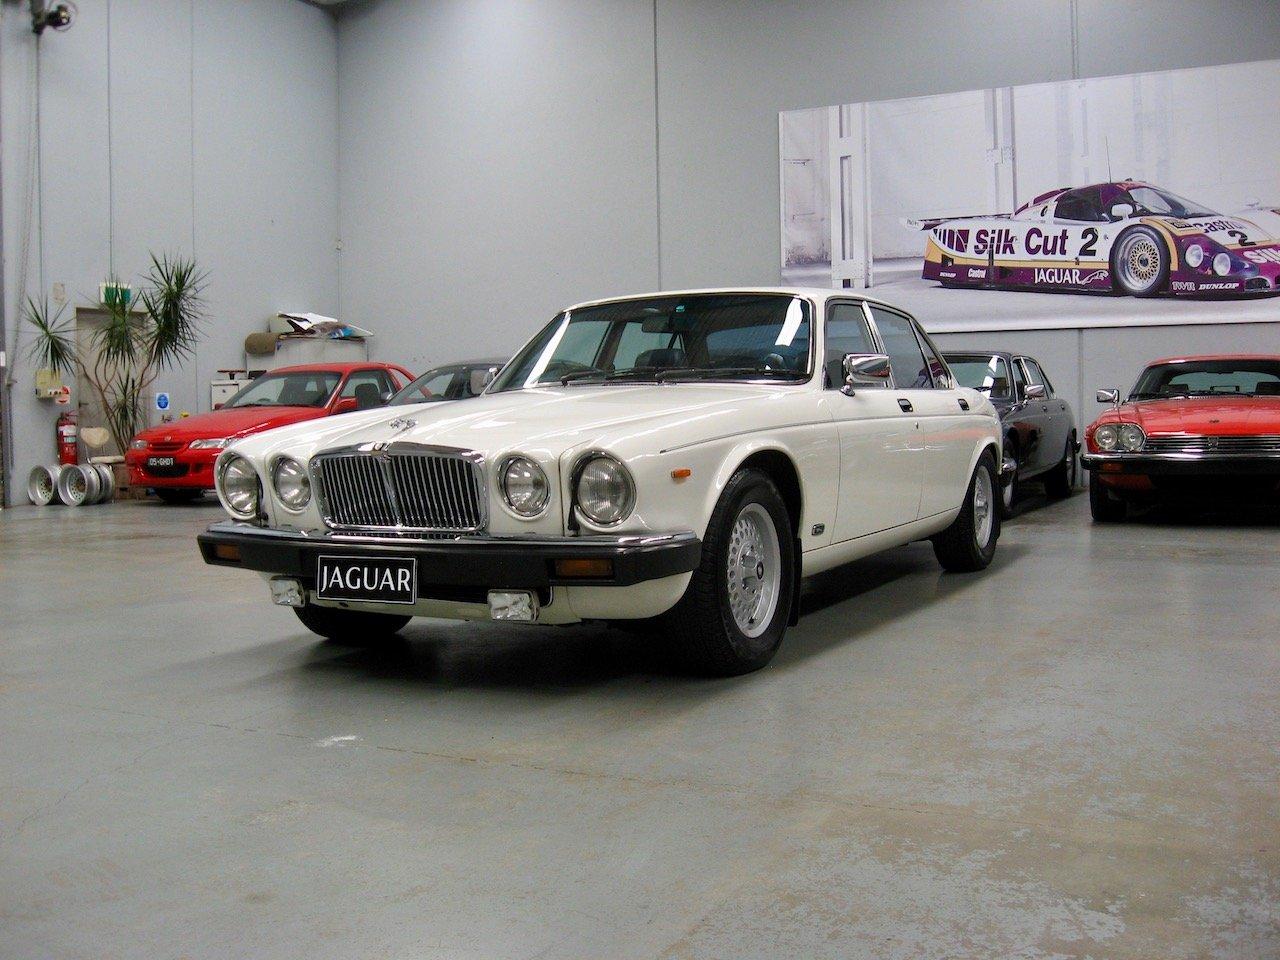 1988 Jaguar XJ12 Series 3 V12 Sovereign For Sale (picture 2 of 6)